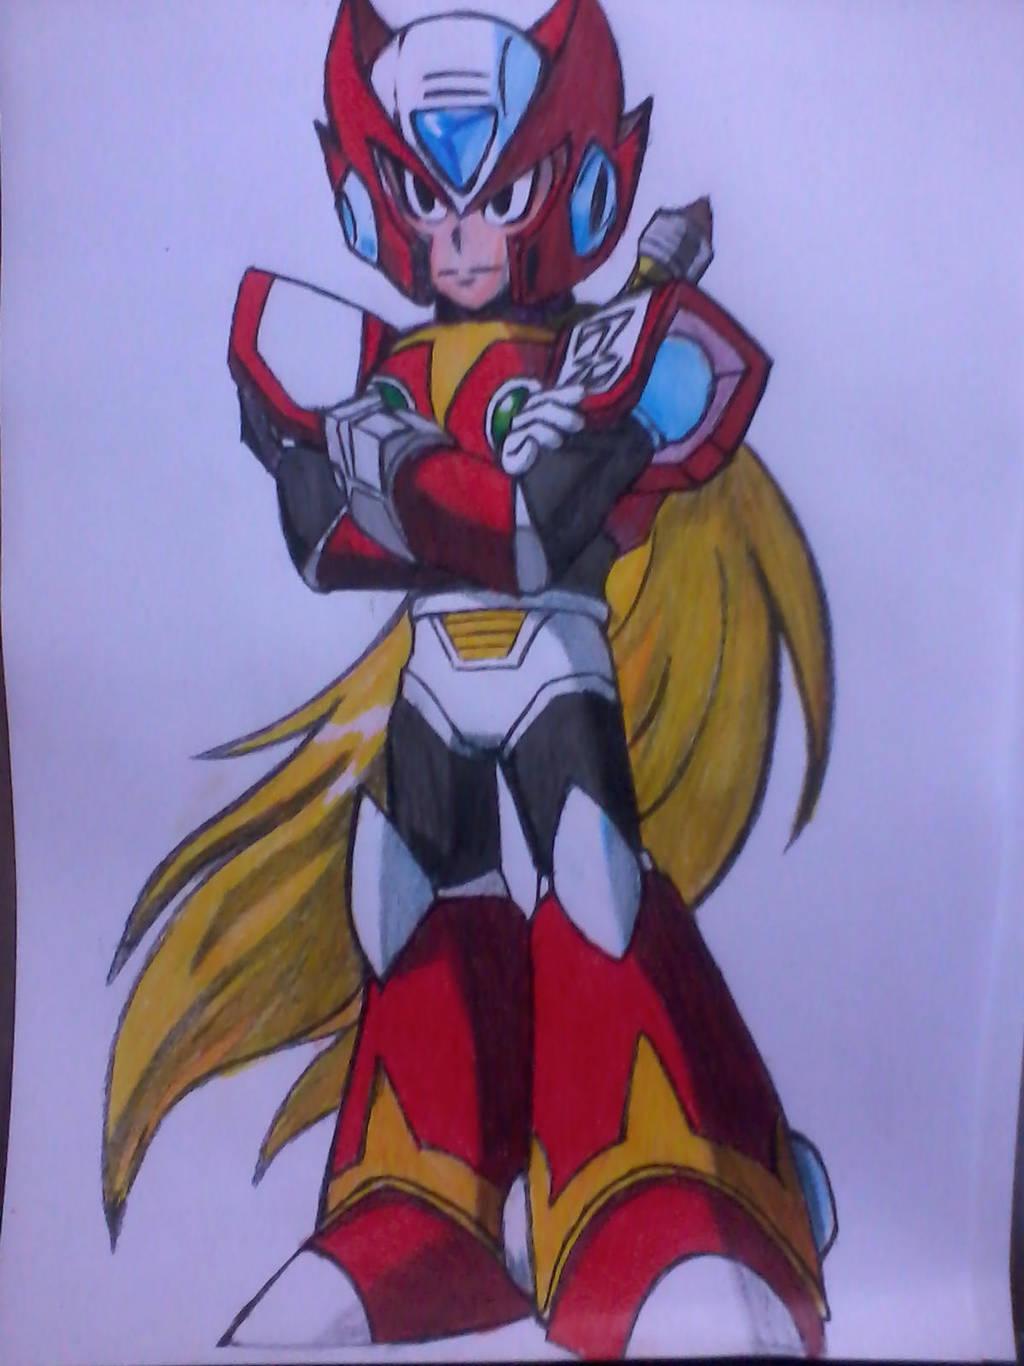 Zero Megaman by ArliissonxD